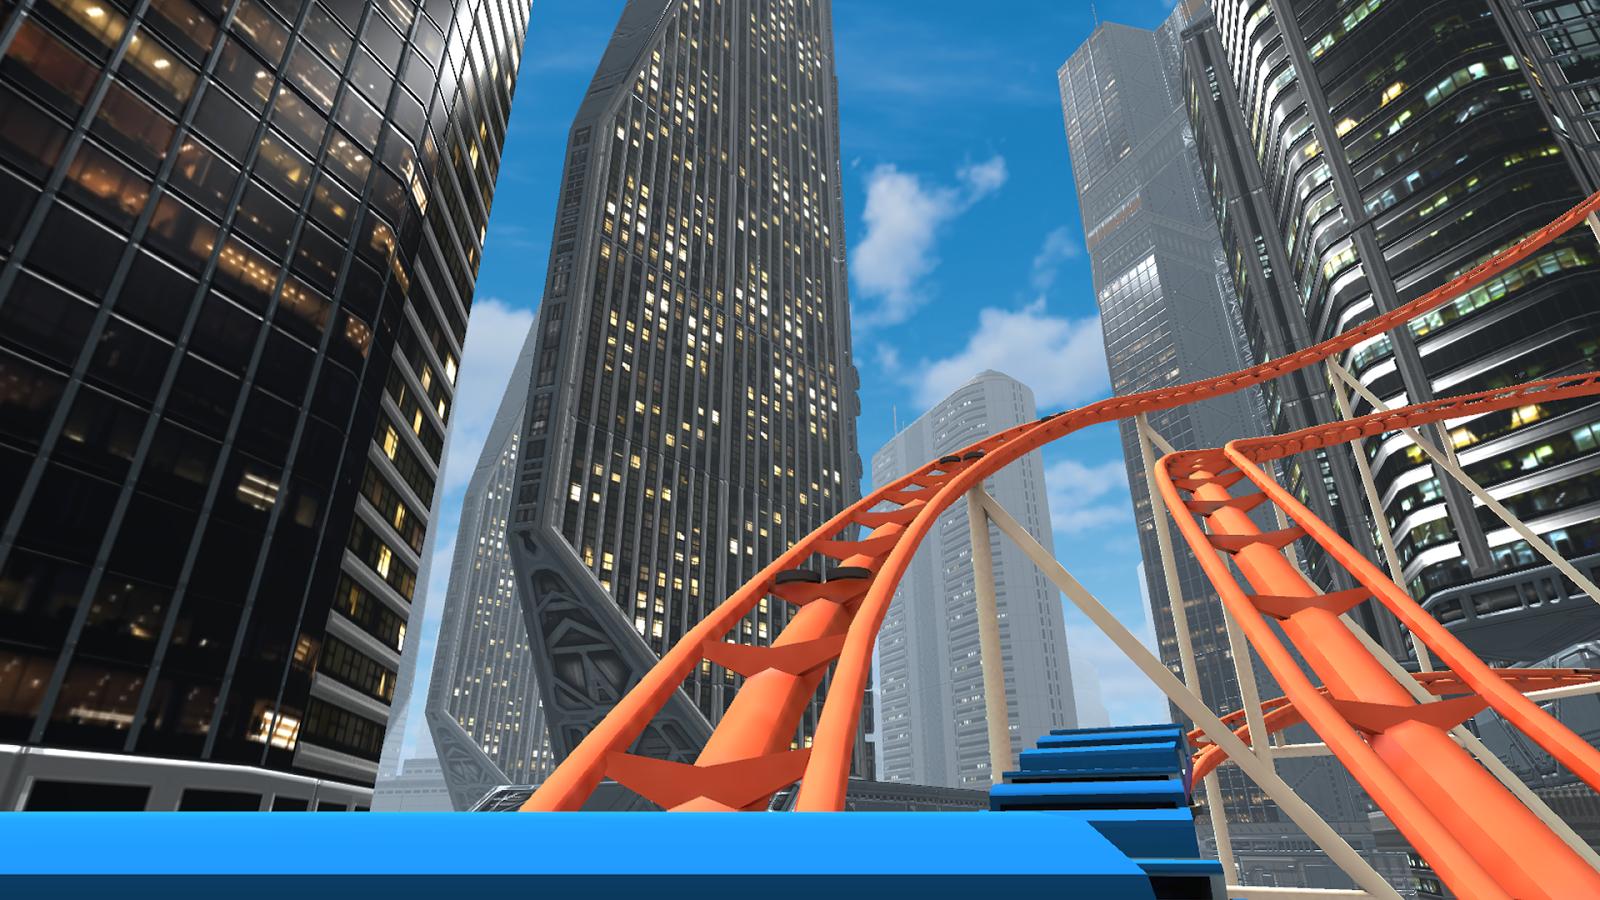 VR - Rollercoaster